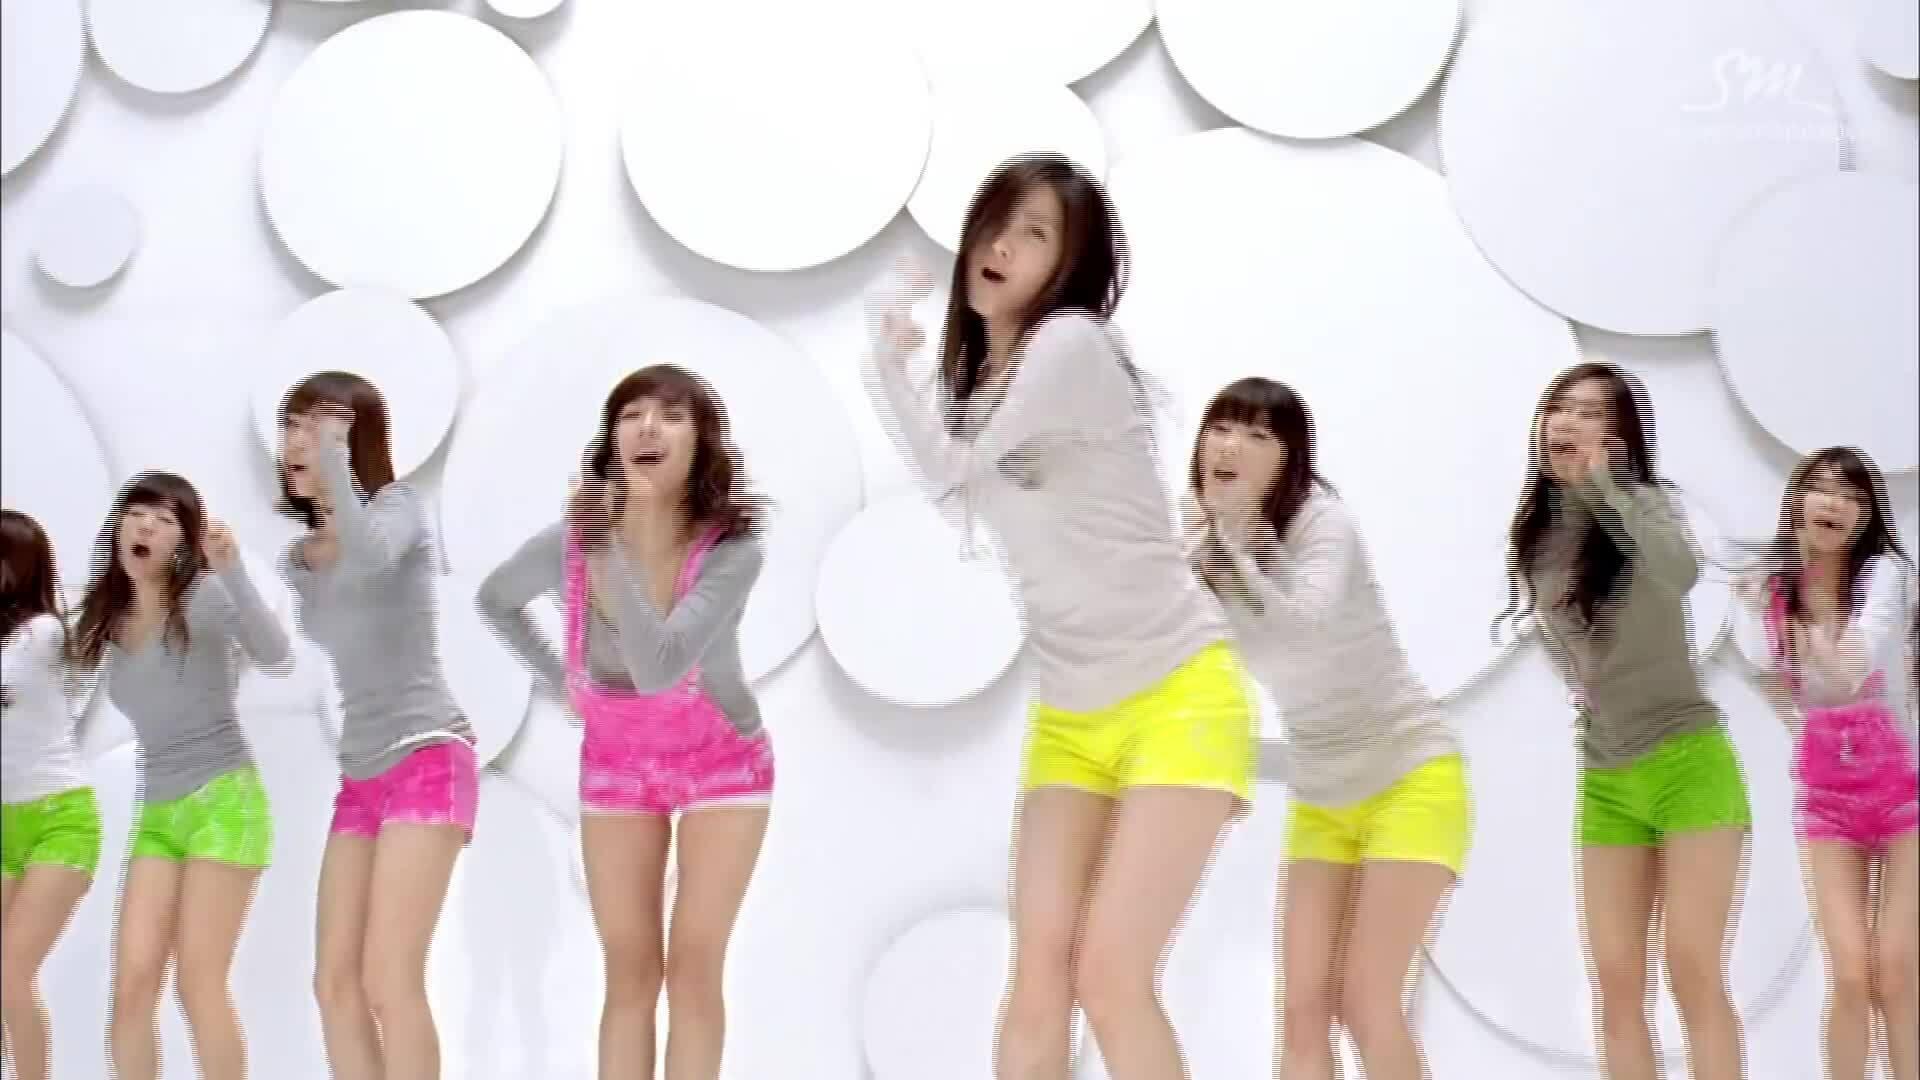 MV 'Gee' - SNSD